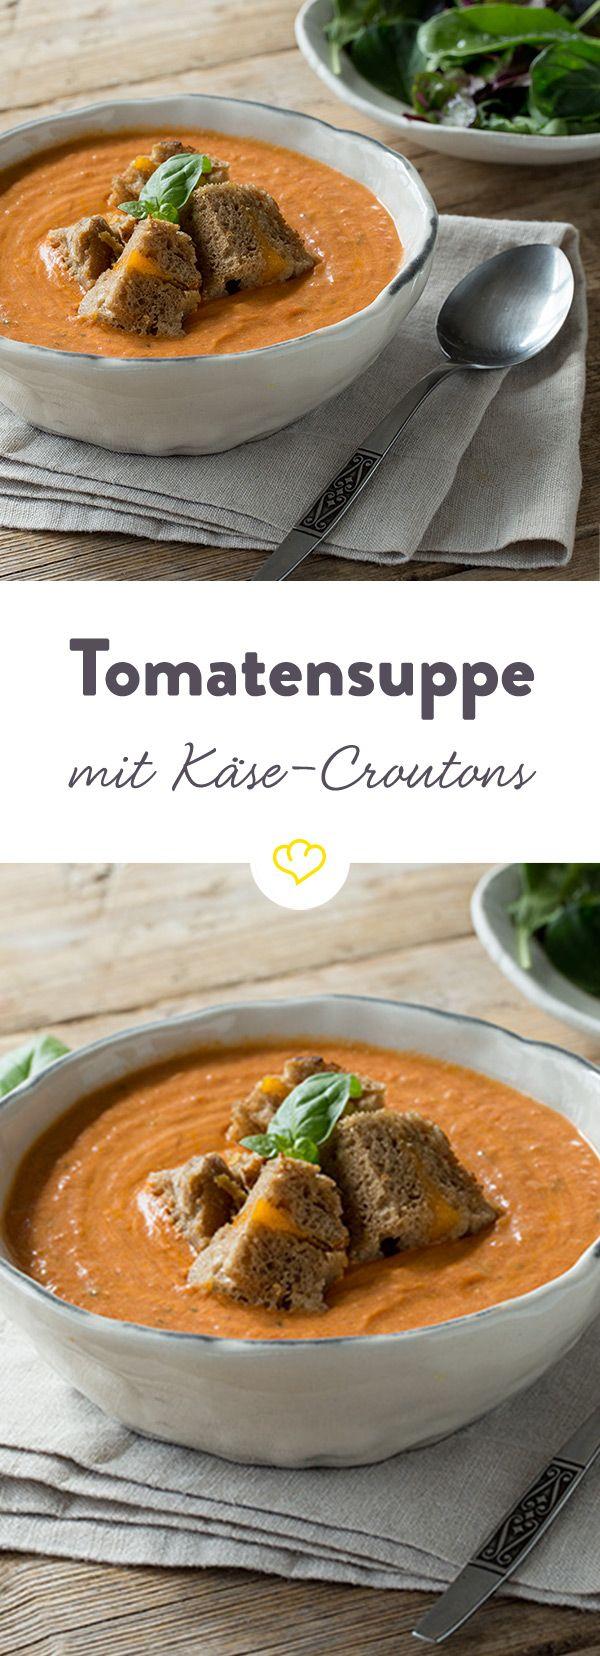 Tomaten-Basilikum-Suppe mit Käse-Croûtons